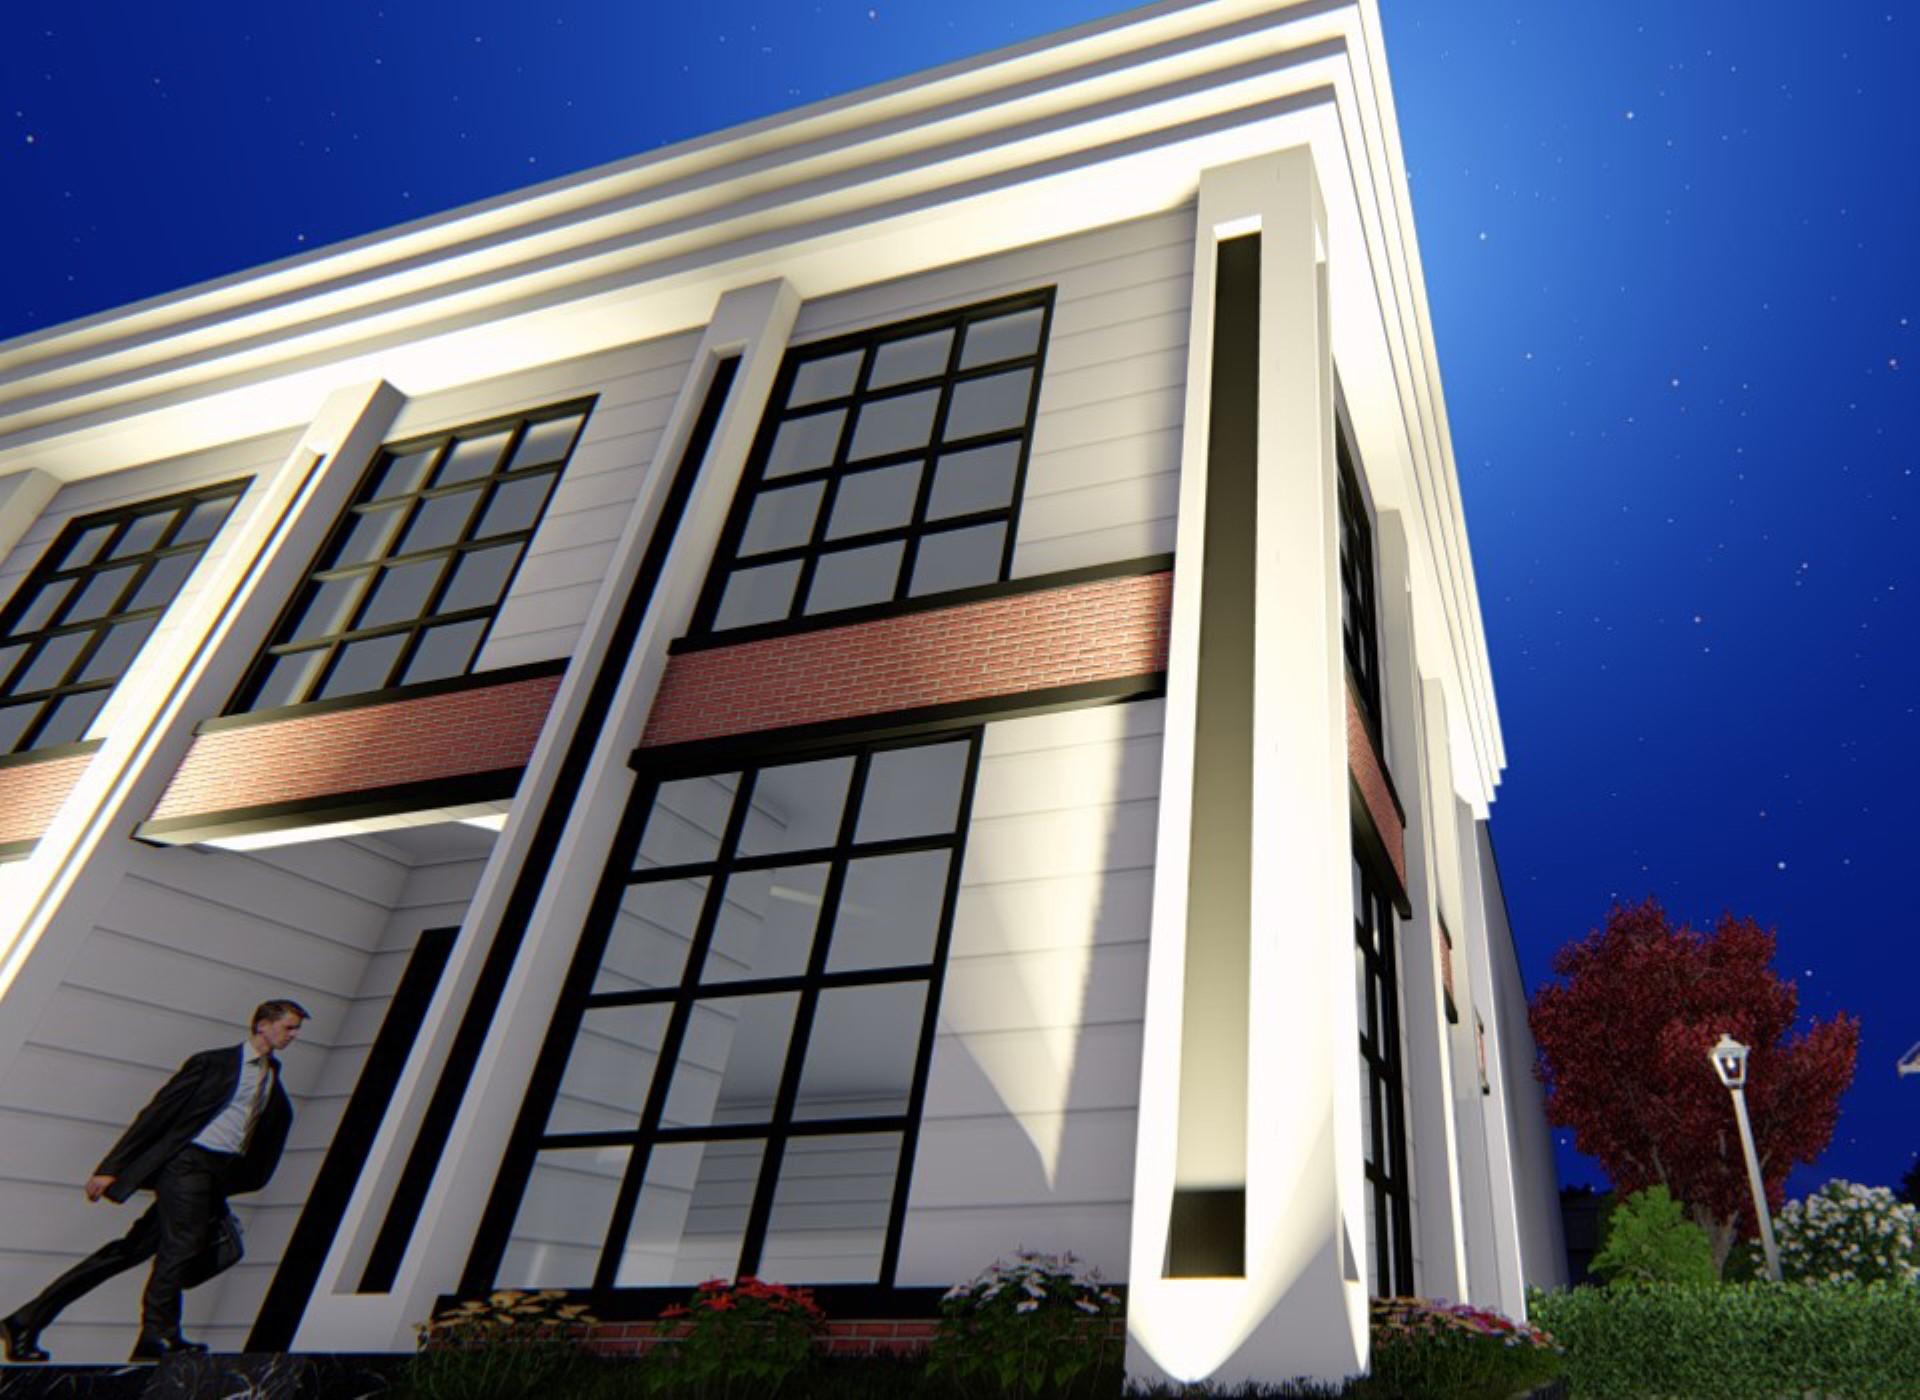 Fabrika İdari Bina Tasarımı